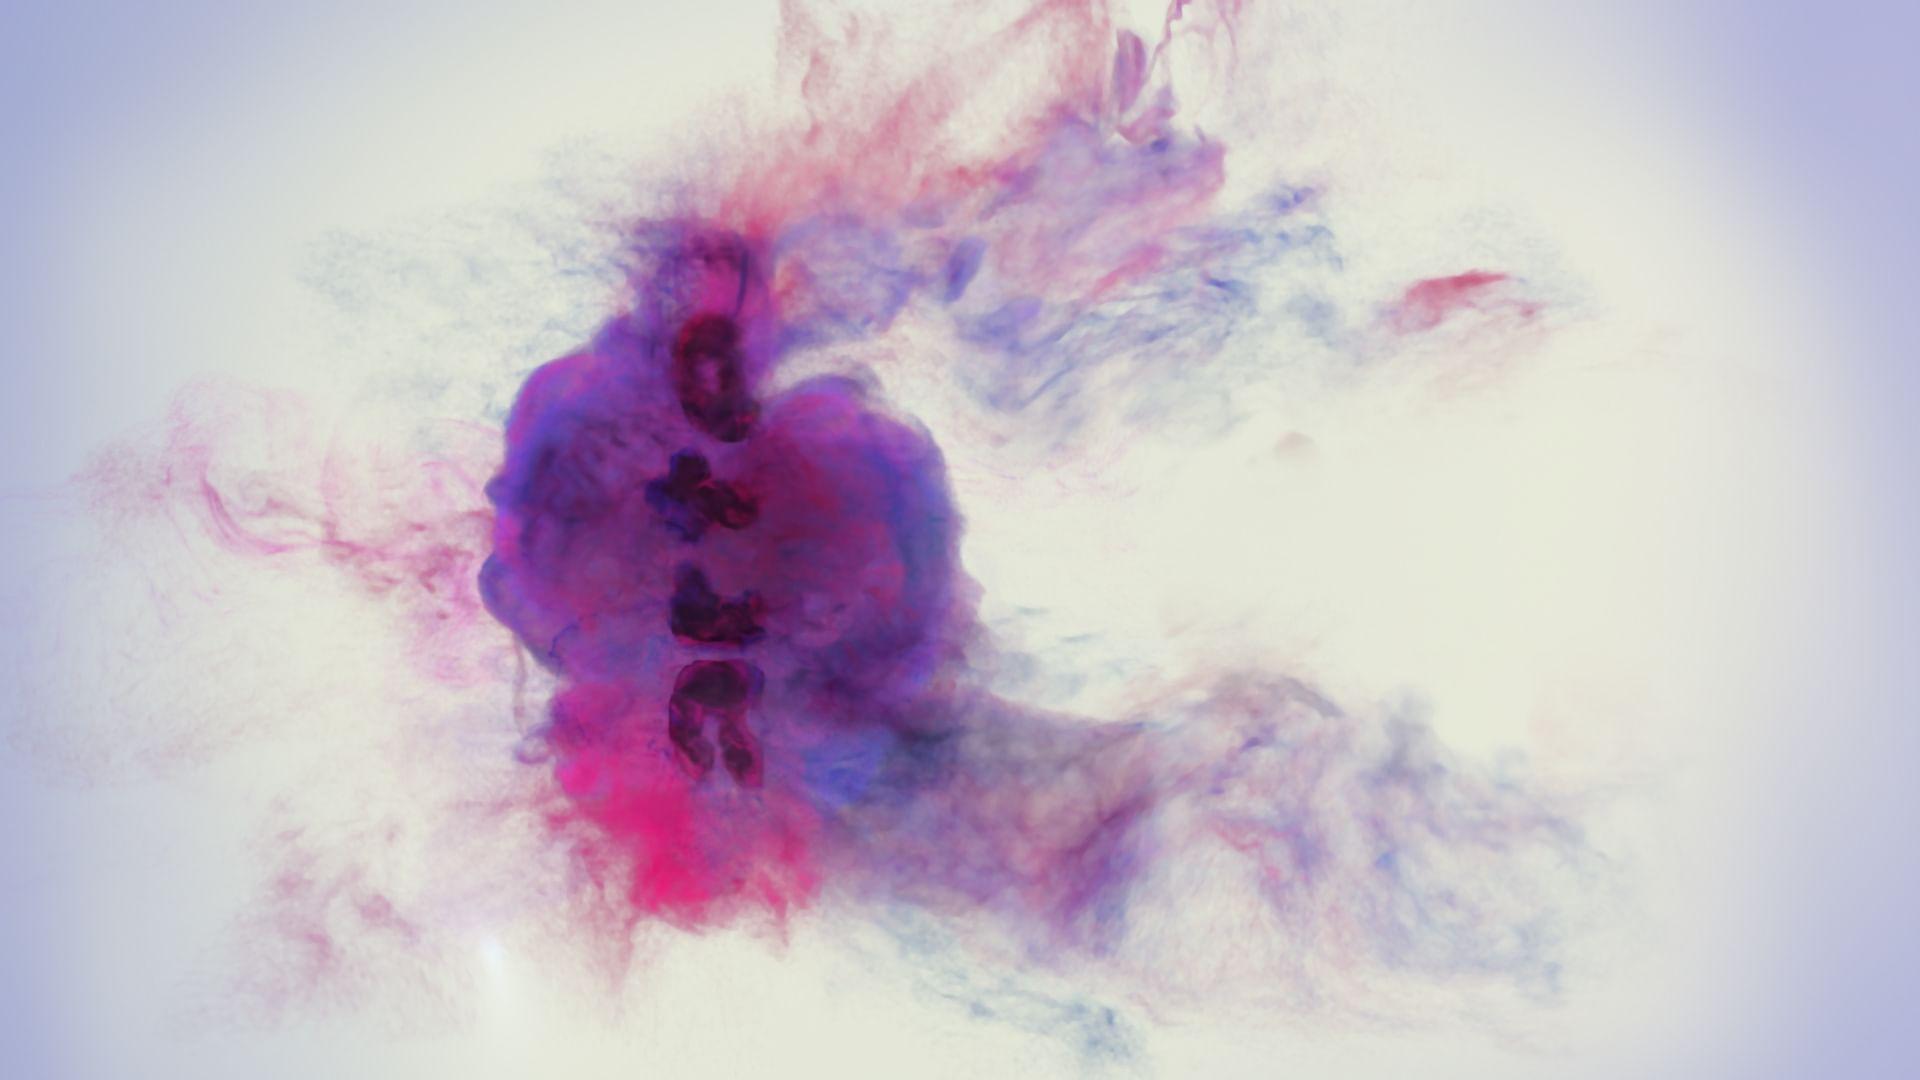 BiTS - Techno dream